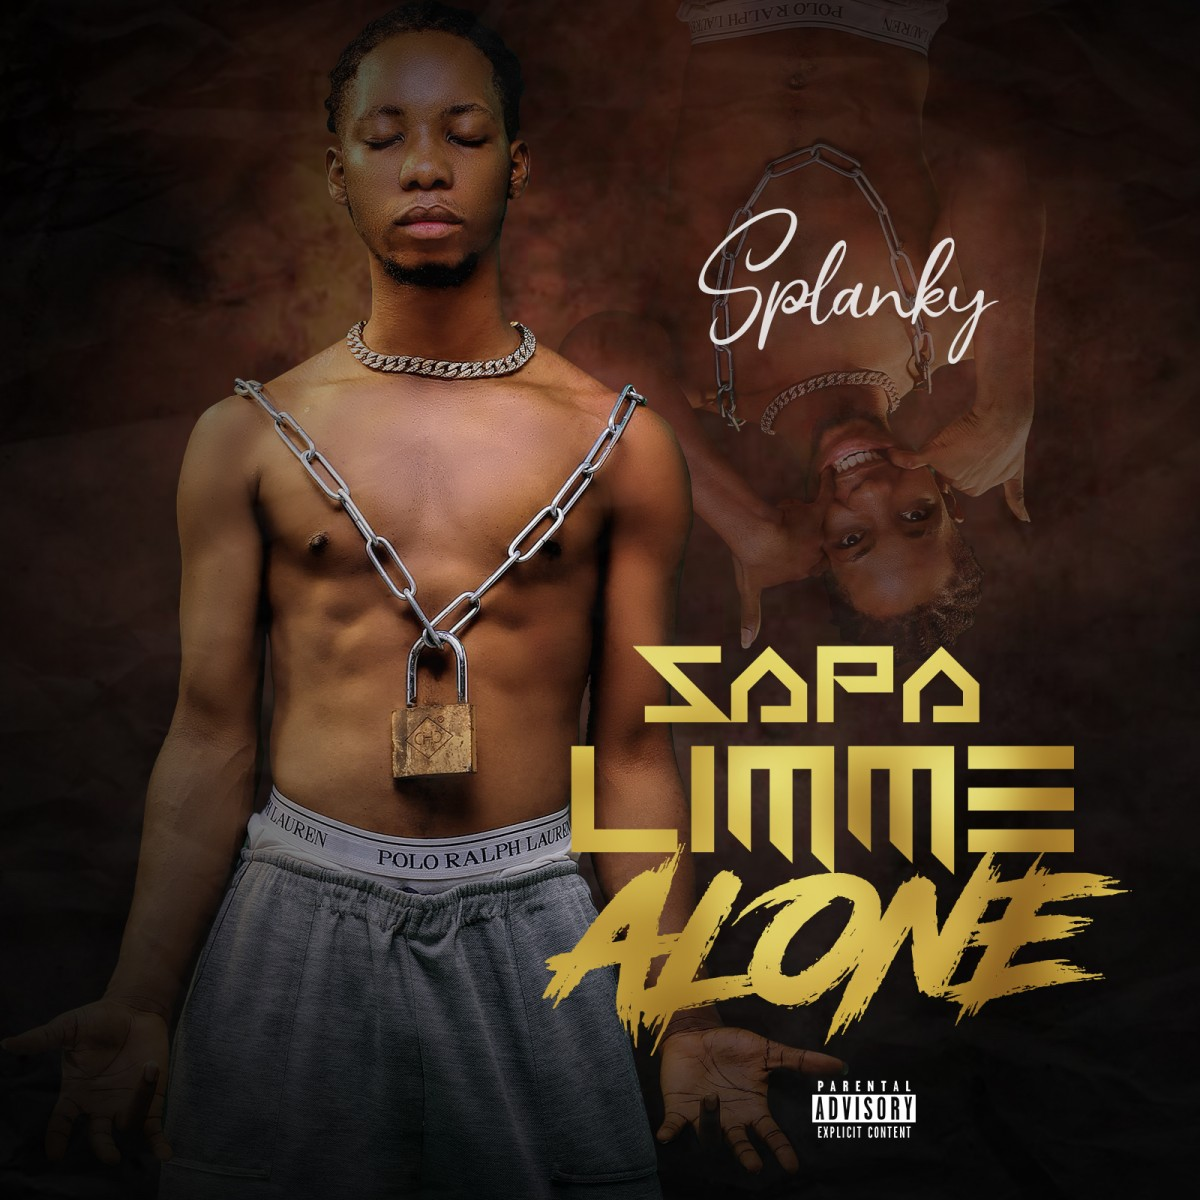 Splanky – Sapa Limme Alone